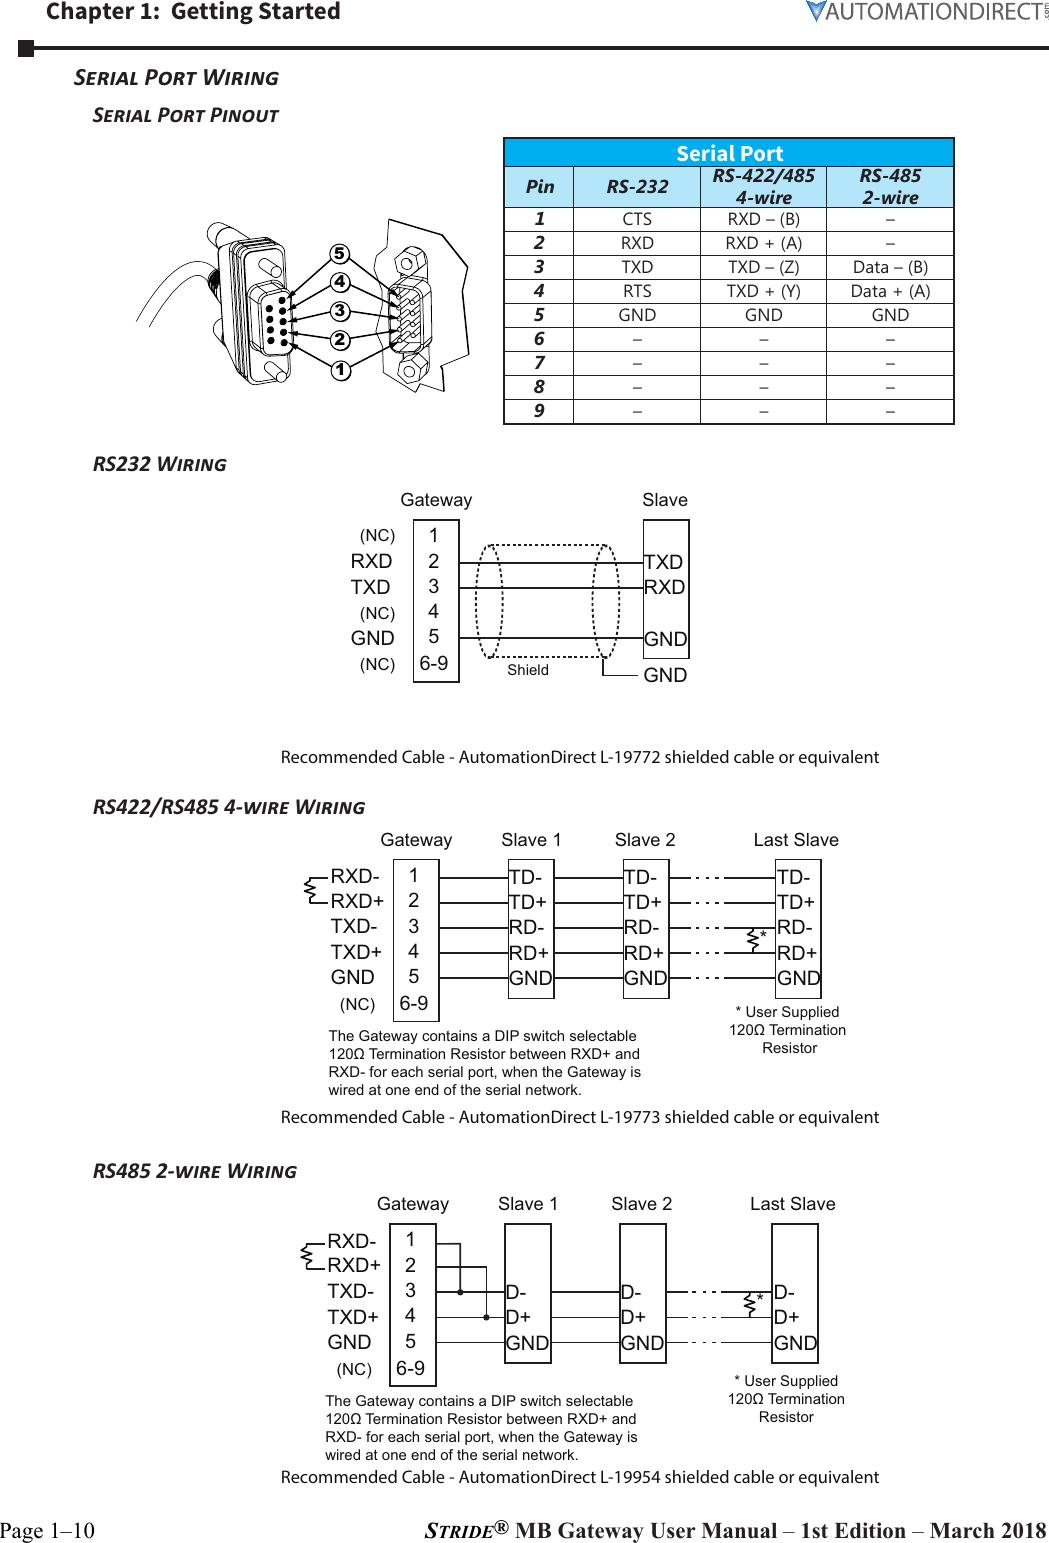 Stupendous Modbus Wiring Diagram Automation Direct Diagram Data Schema Wiring 101 Mecadwellnesstrialsorg